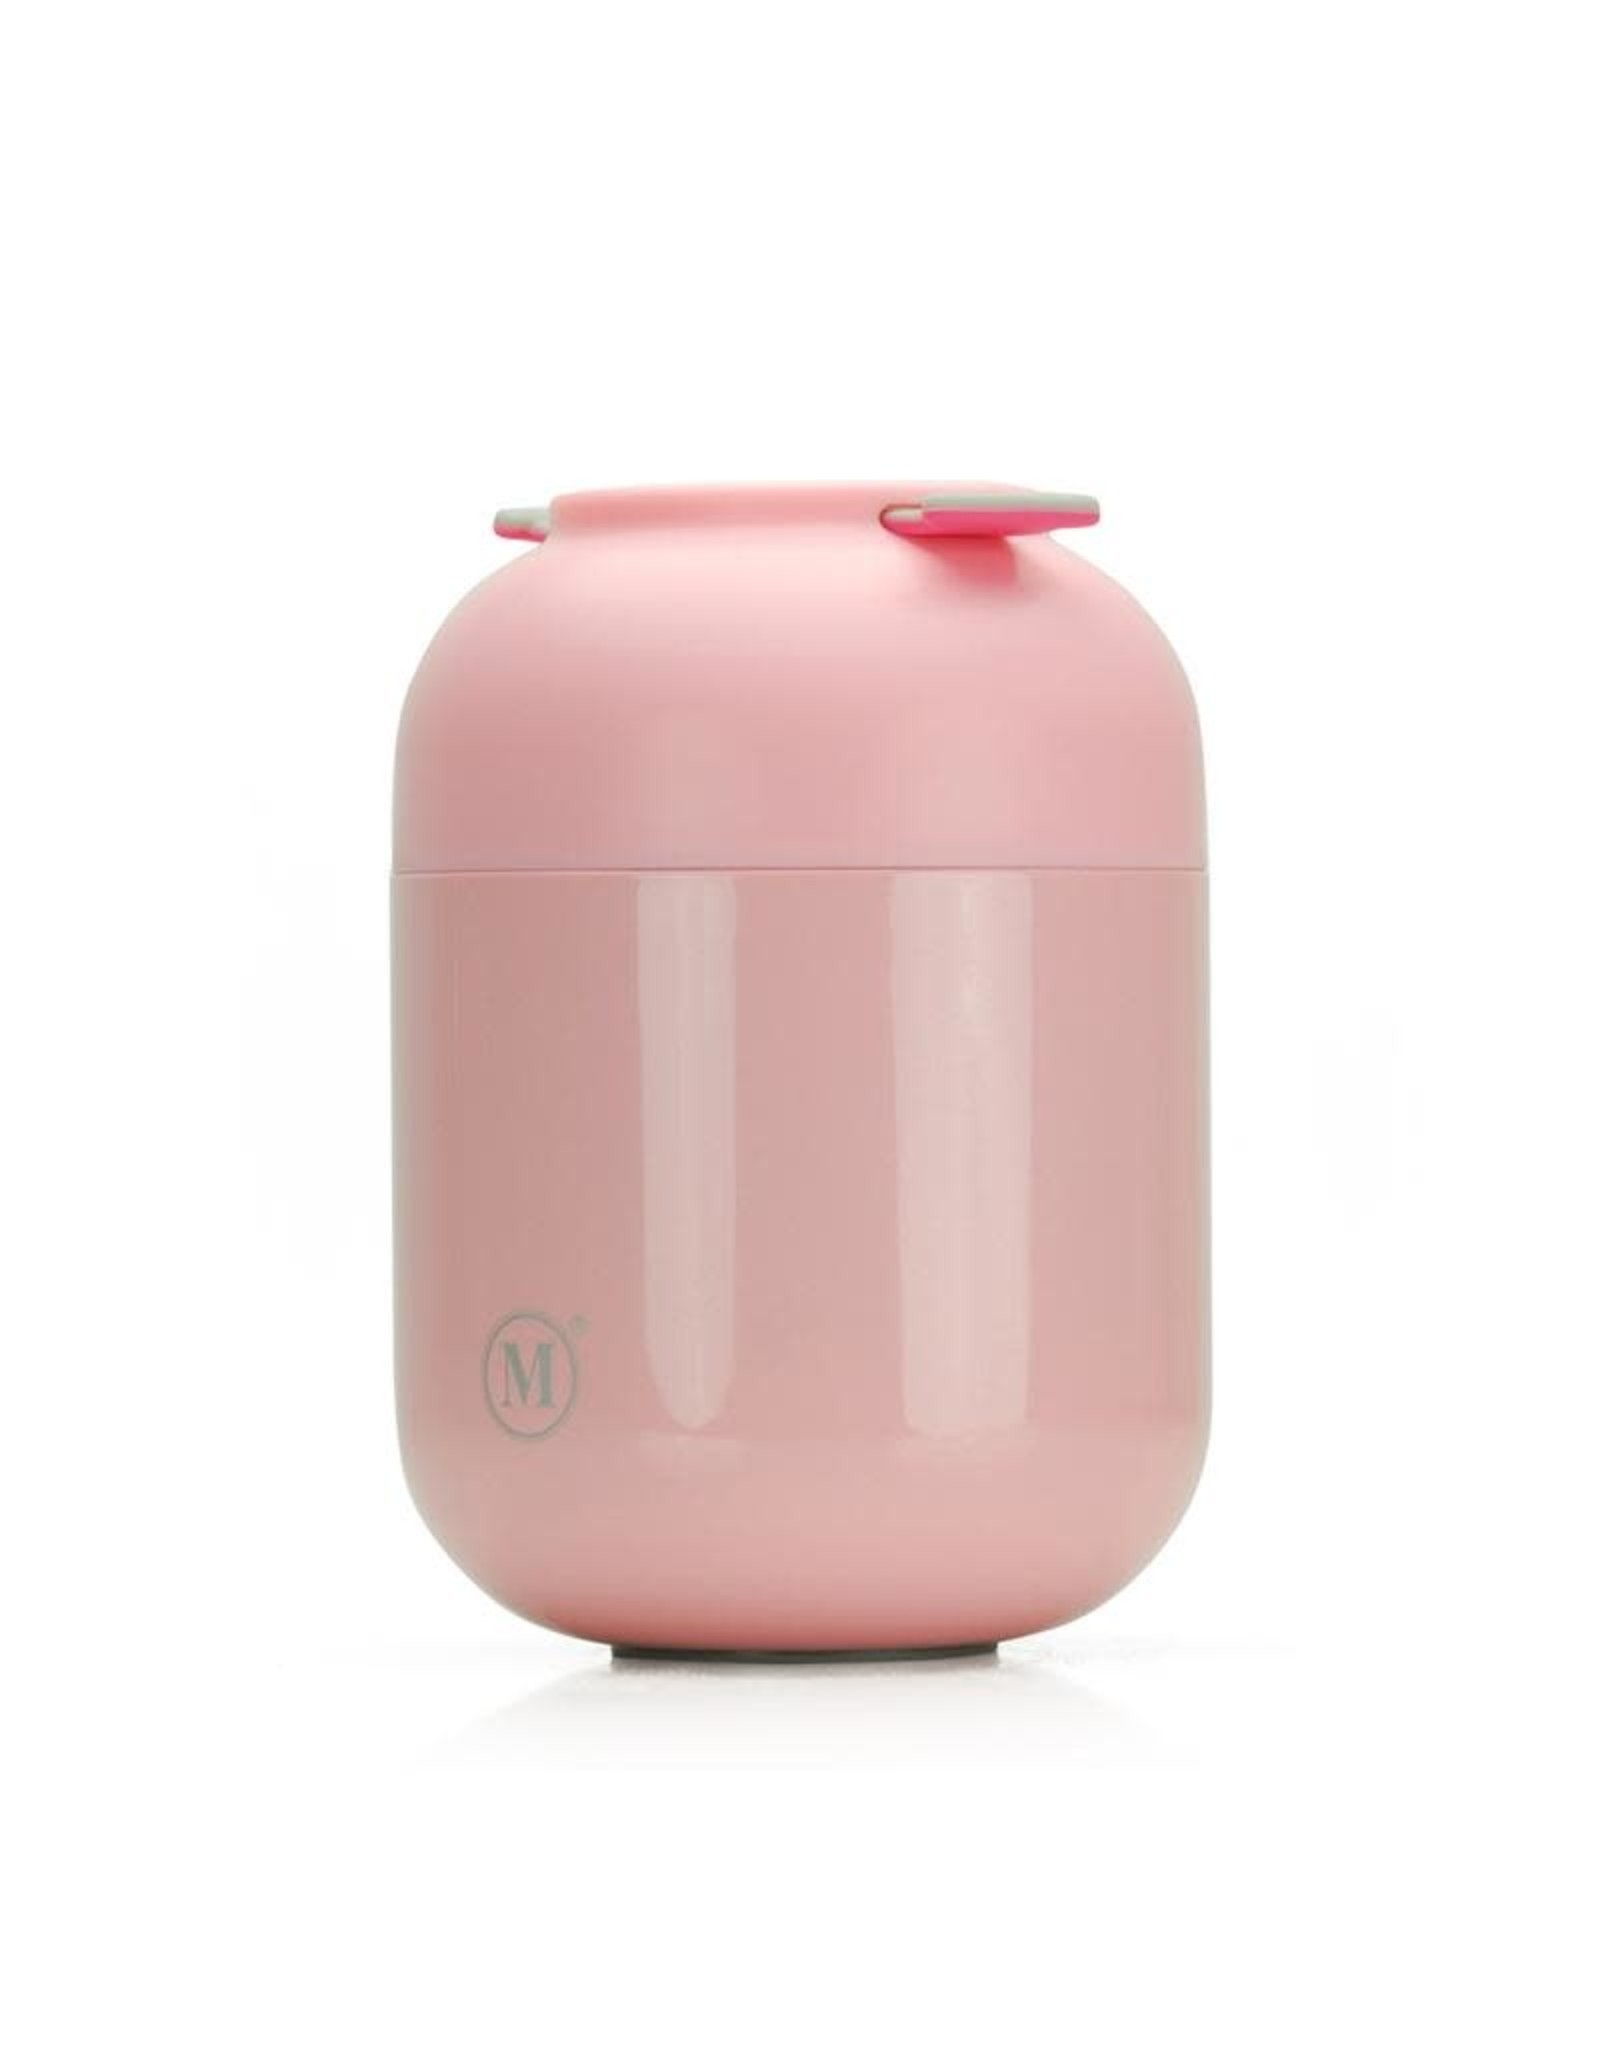 Minimal Nexten Minimal Insulated Food Jar V2 700mL - Rose